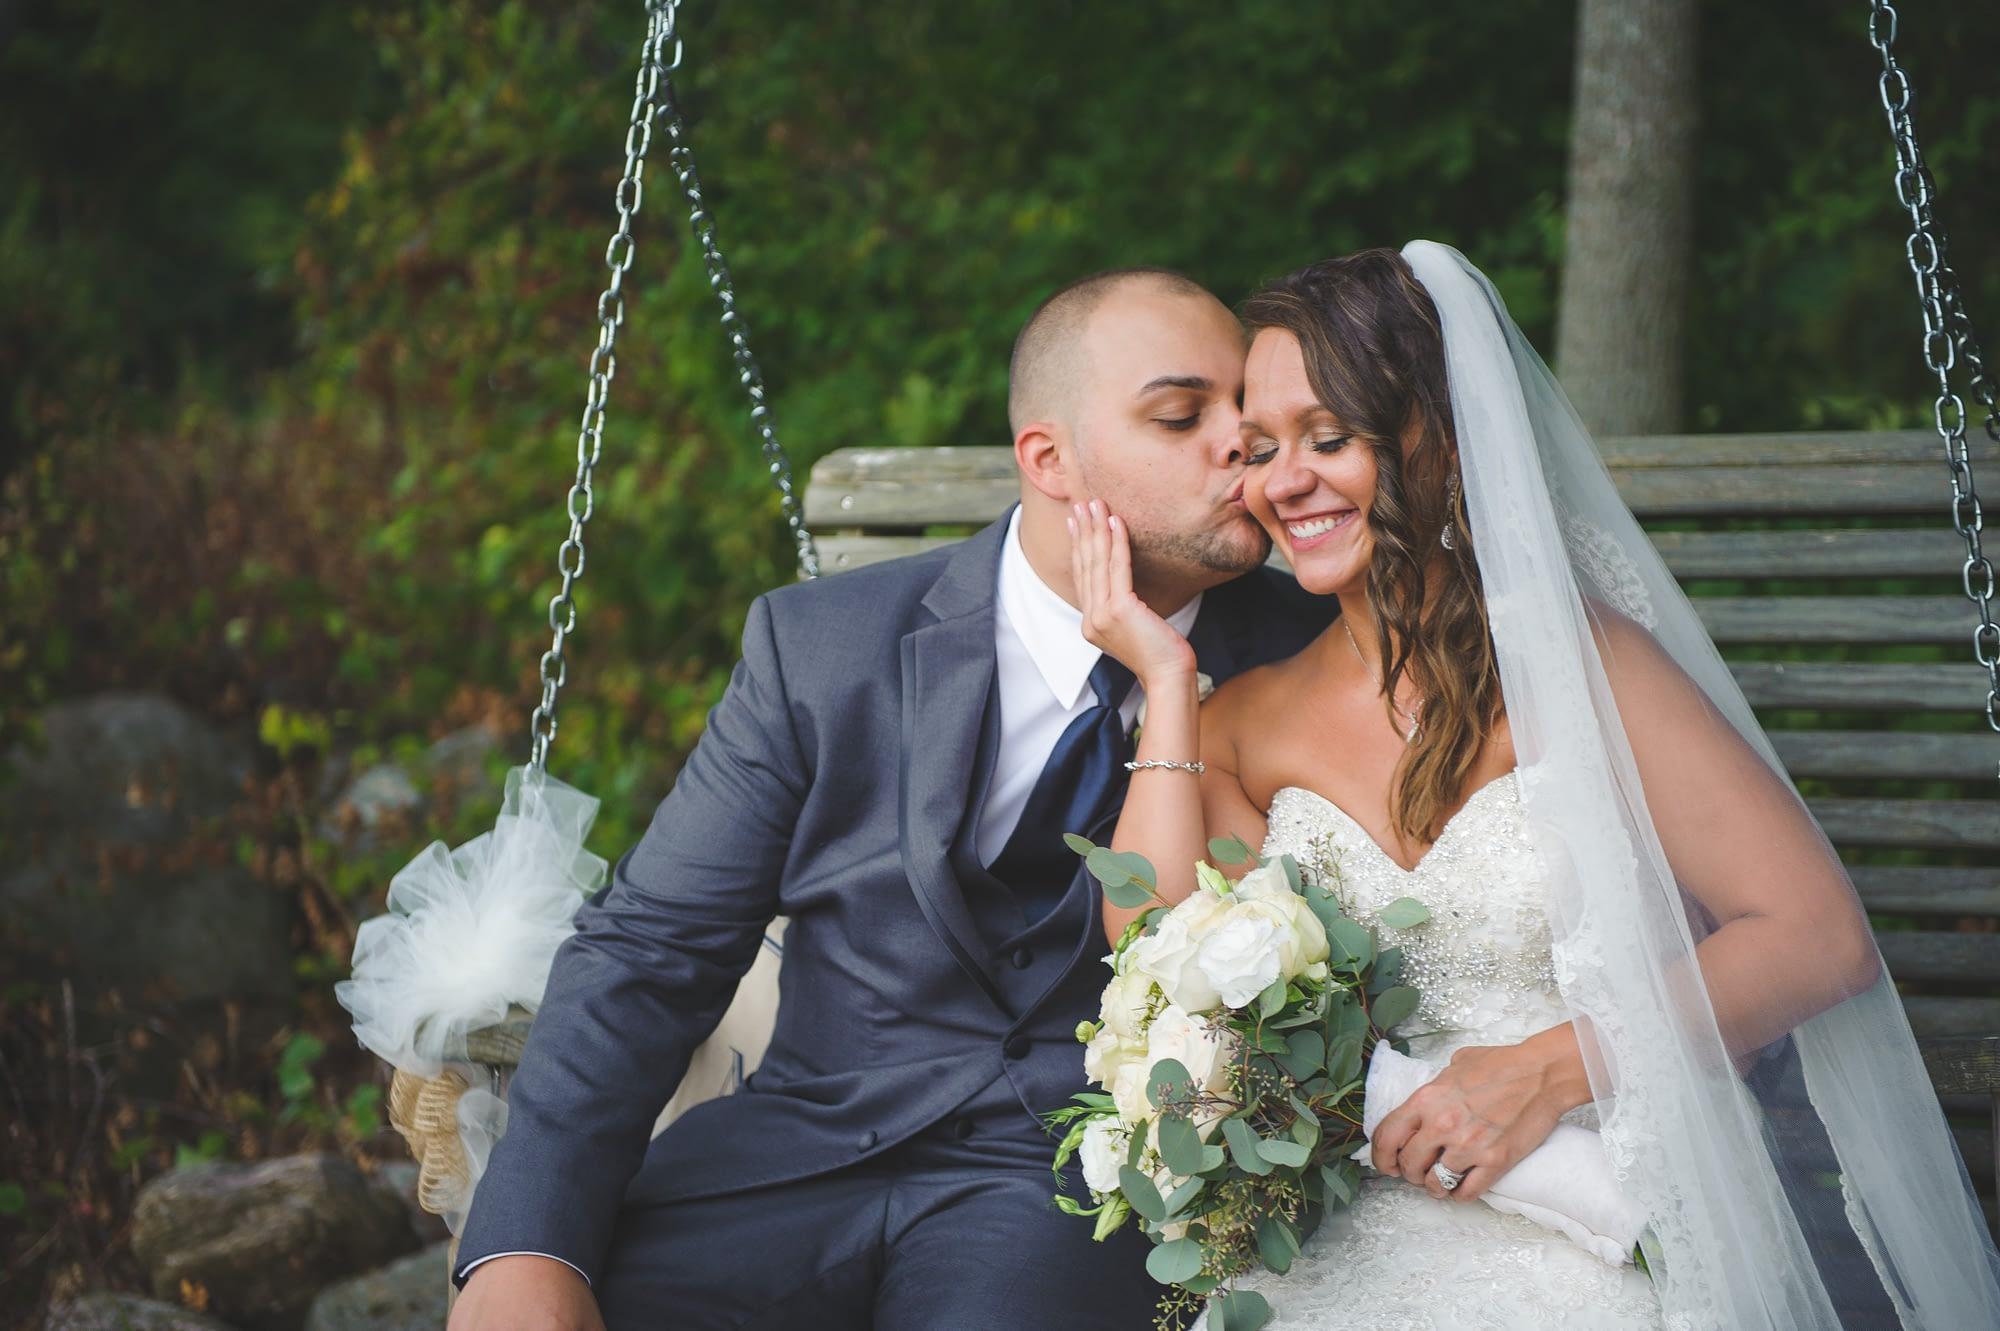 Priam Vineyards Wedding Photographer | CT Wedding photographer Elizabeth Frederick photography